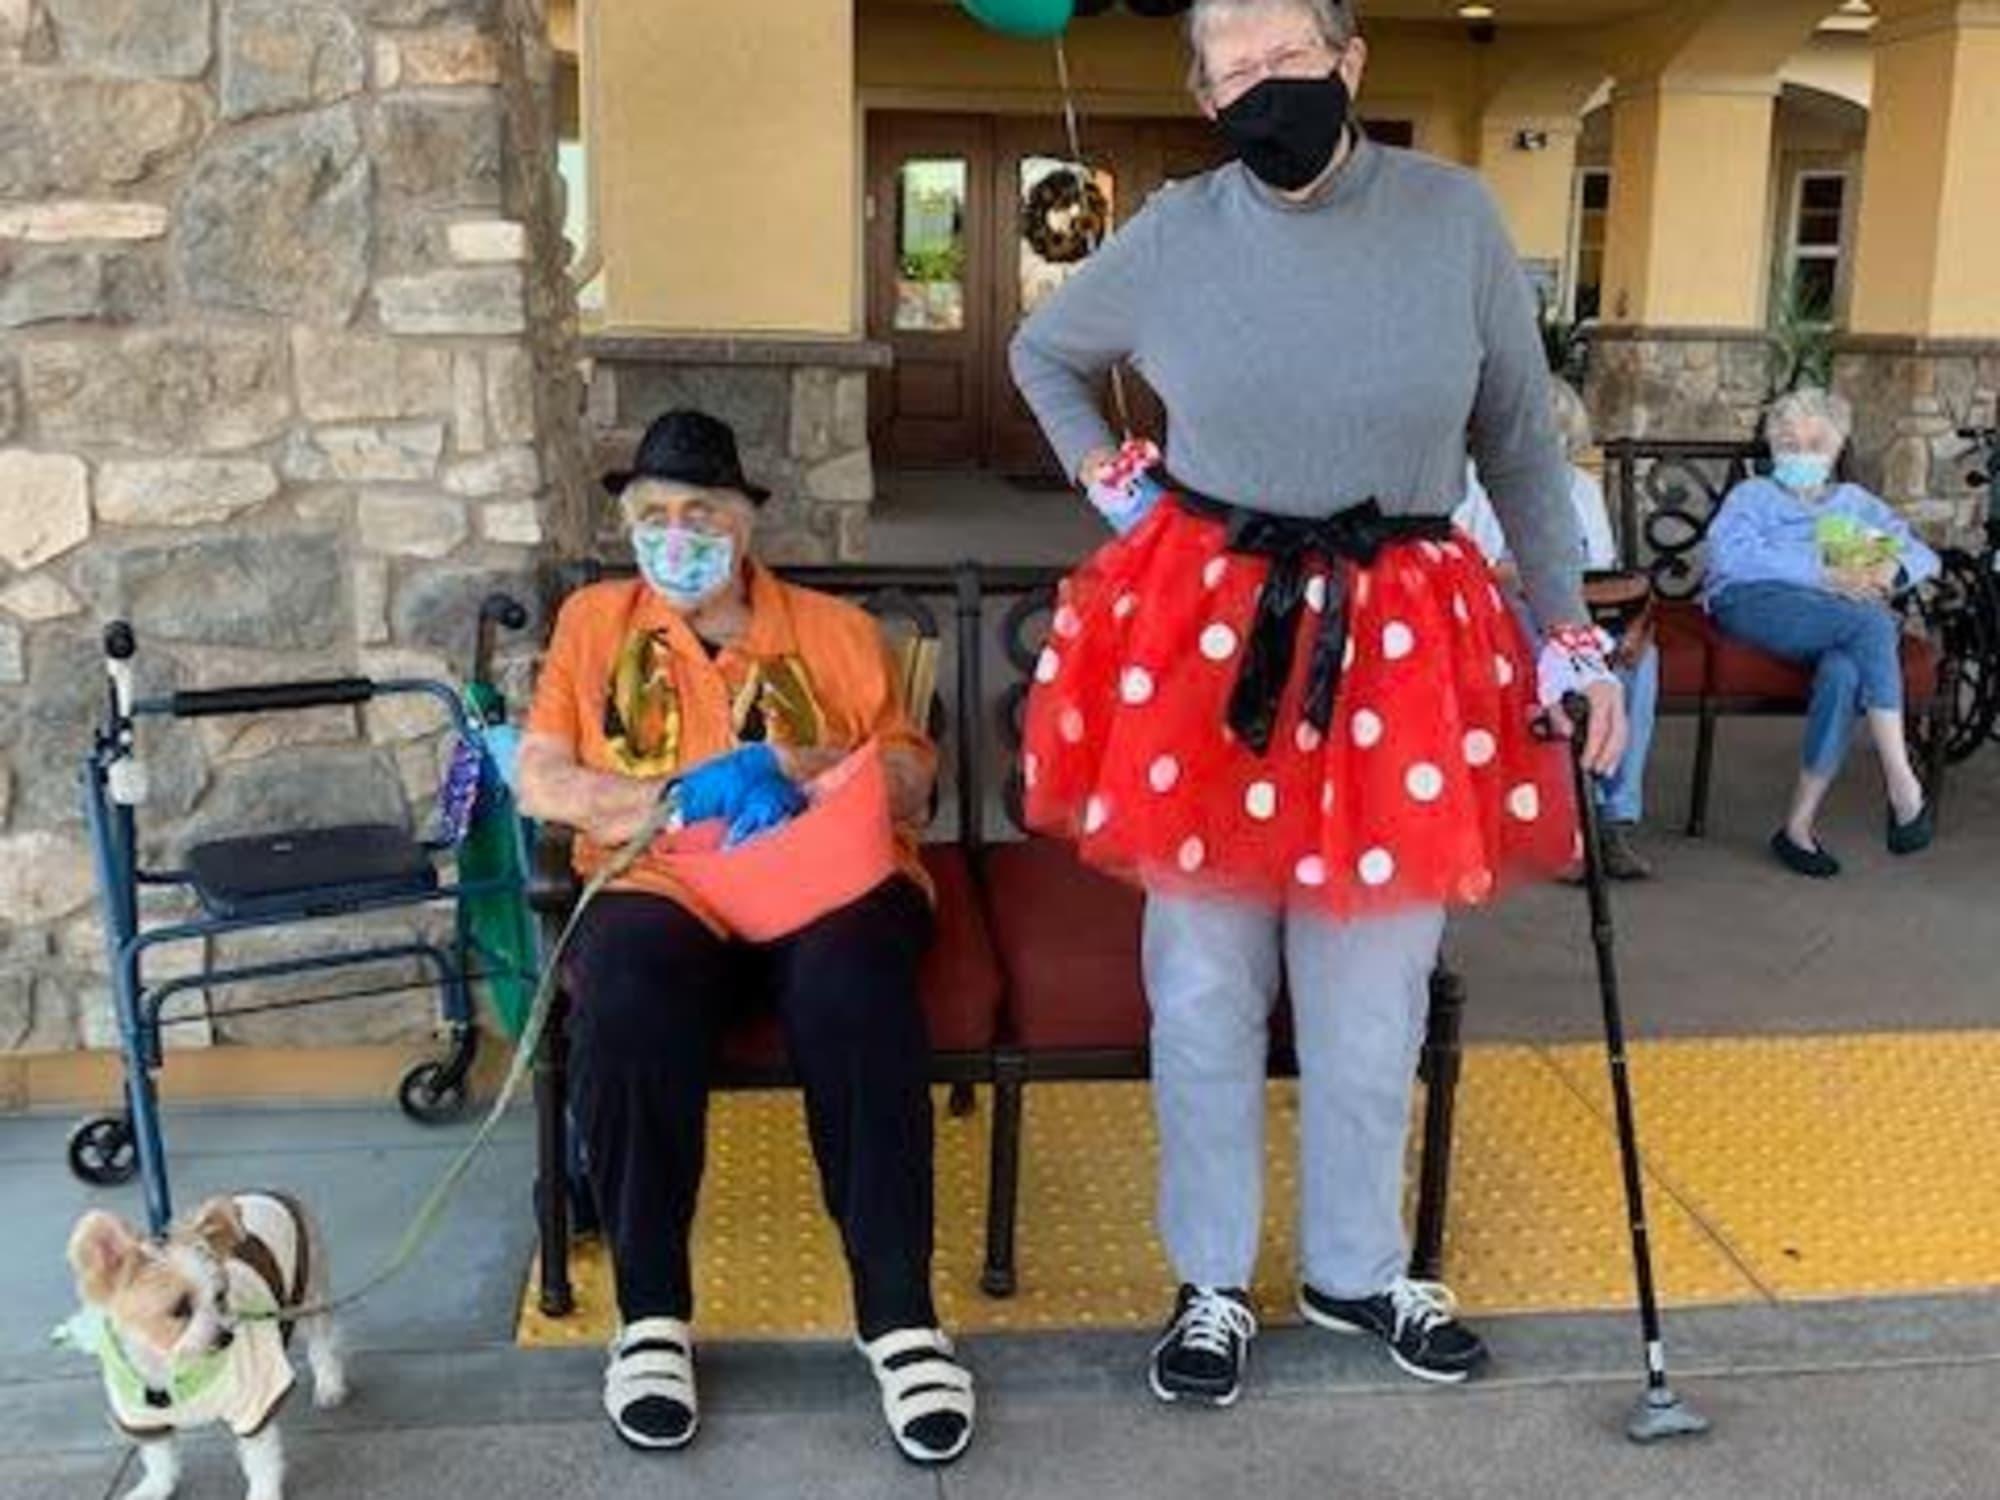 Halloween costumes at Estancia Del Sol in Corona, CA